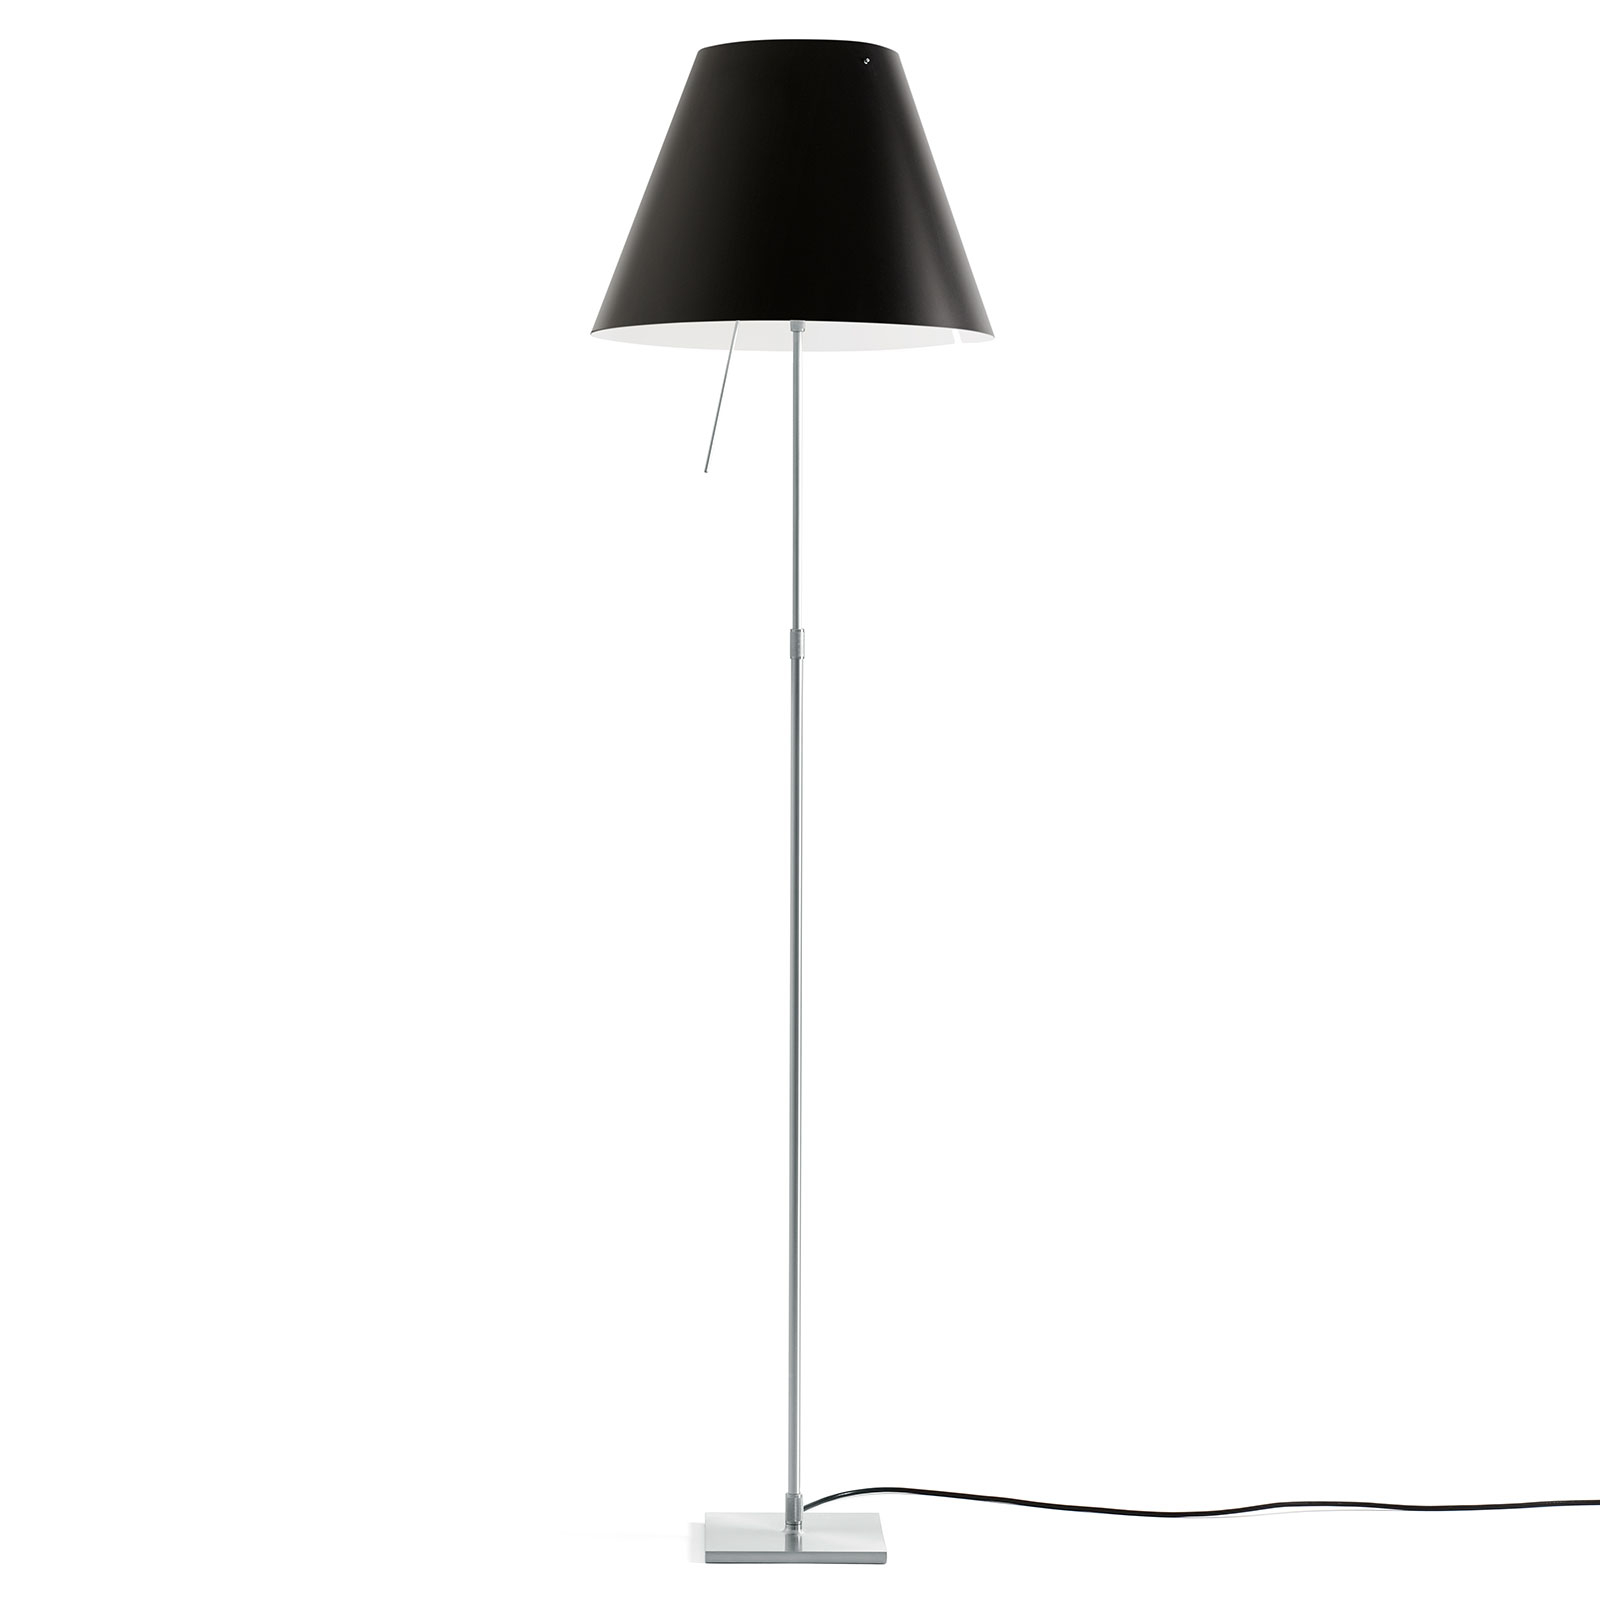 Luceplan Costanza vloerlamp D13t, alu/zwart